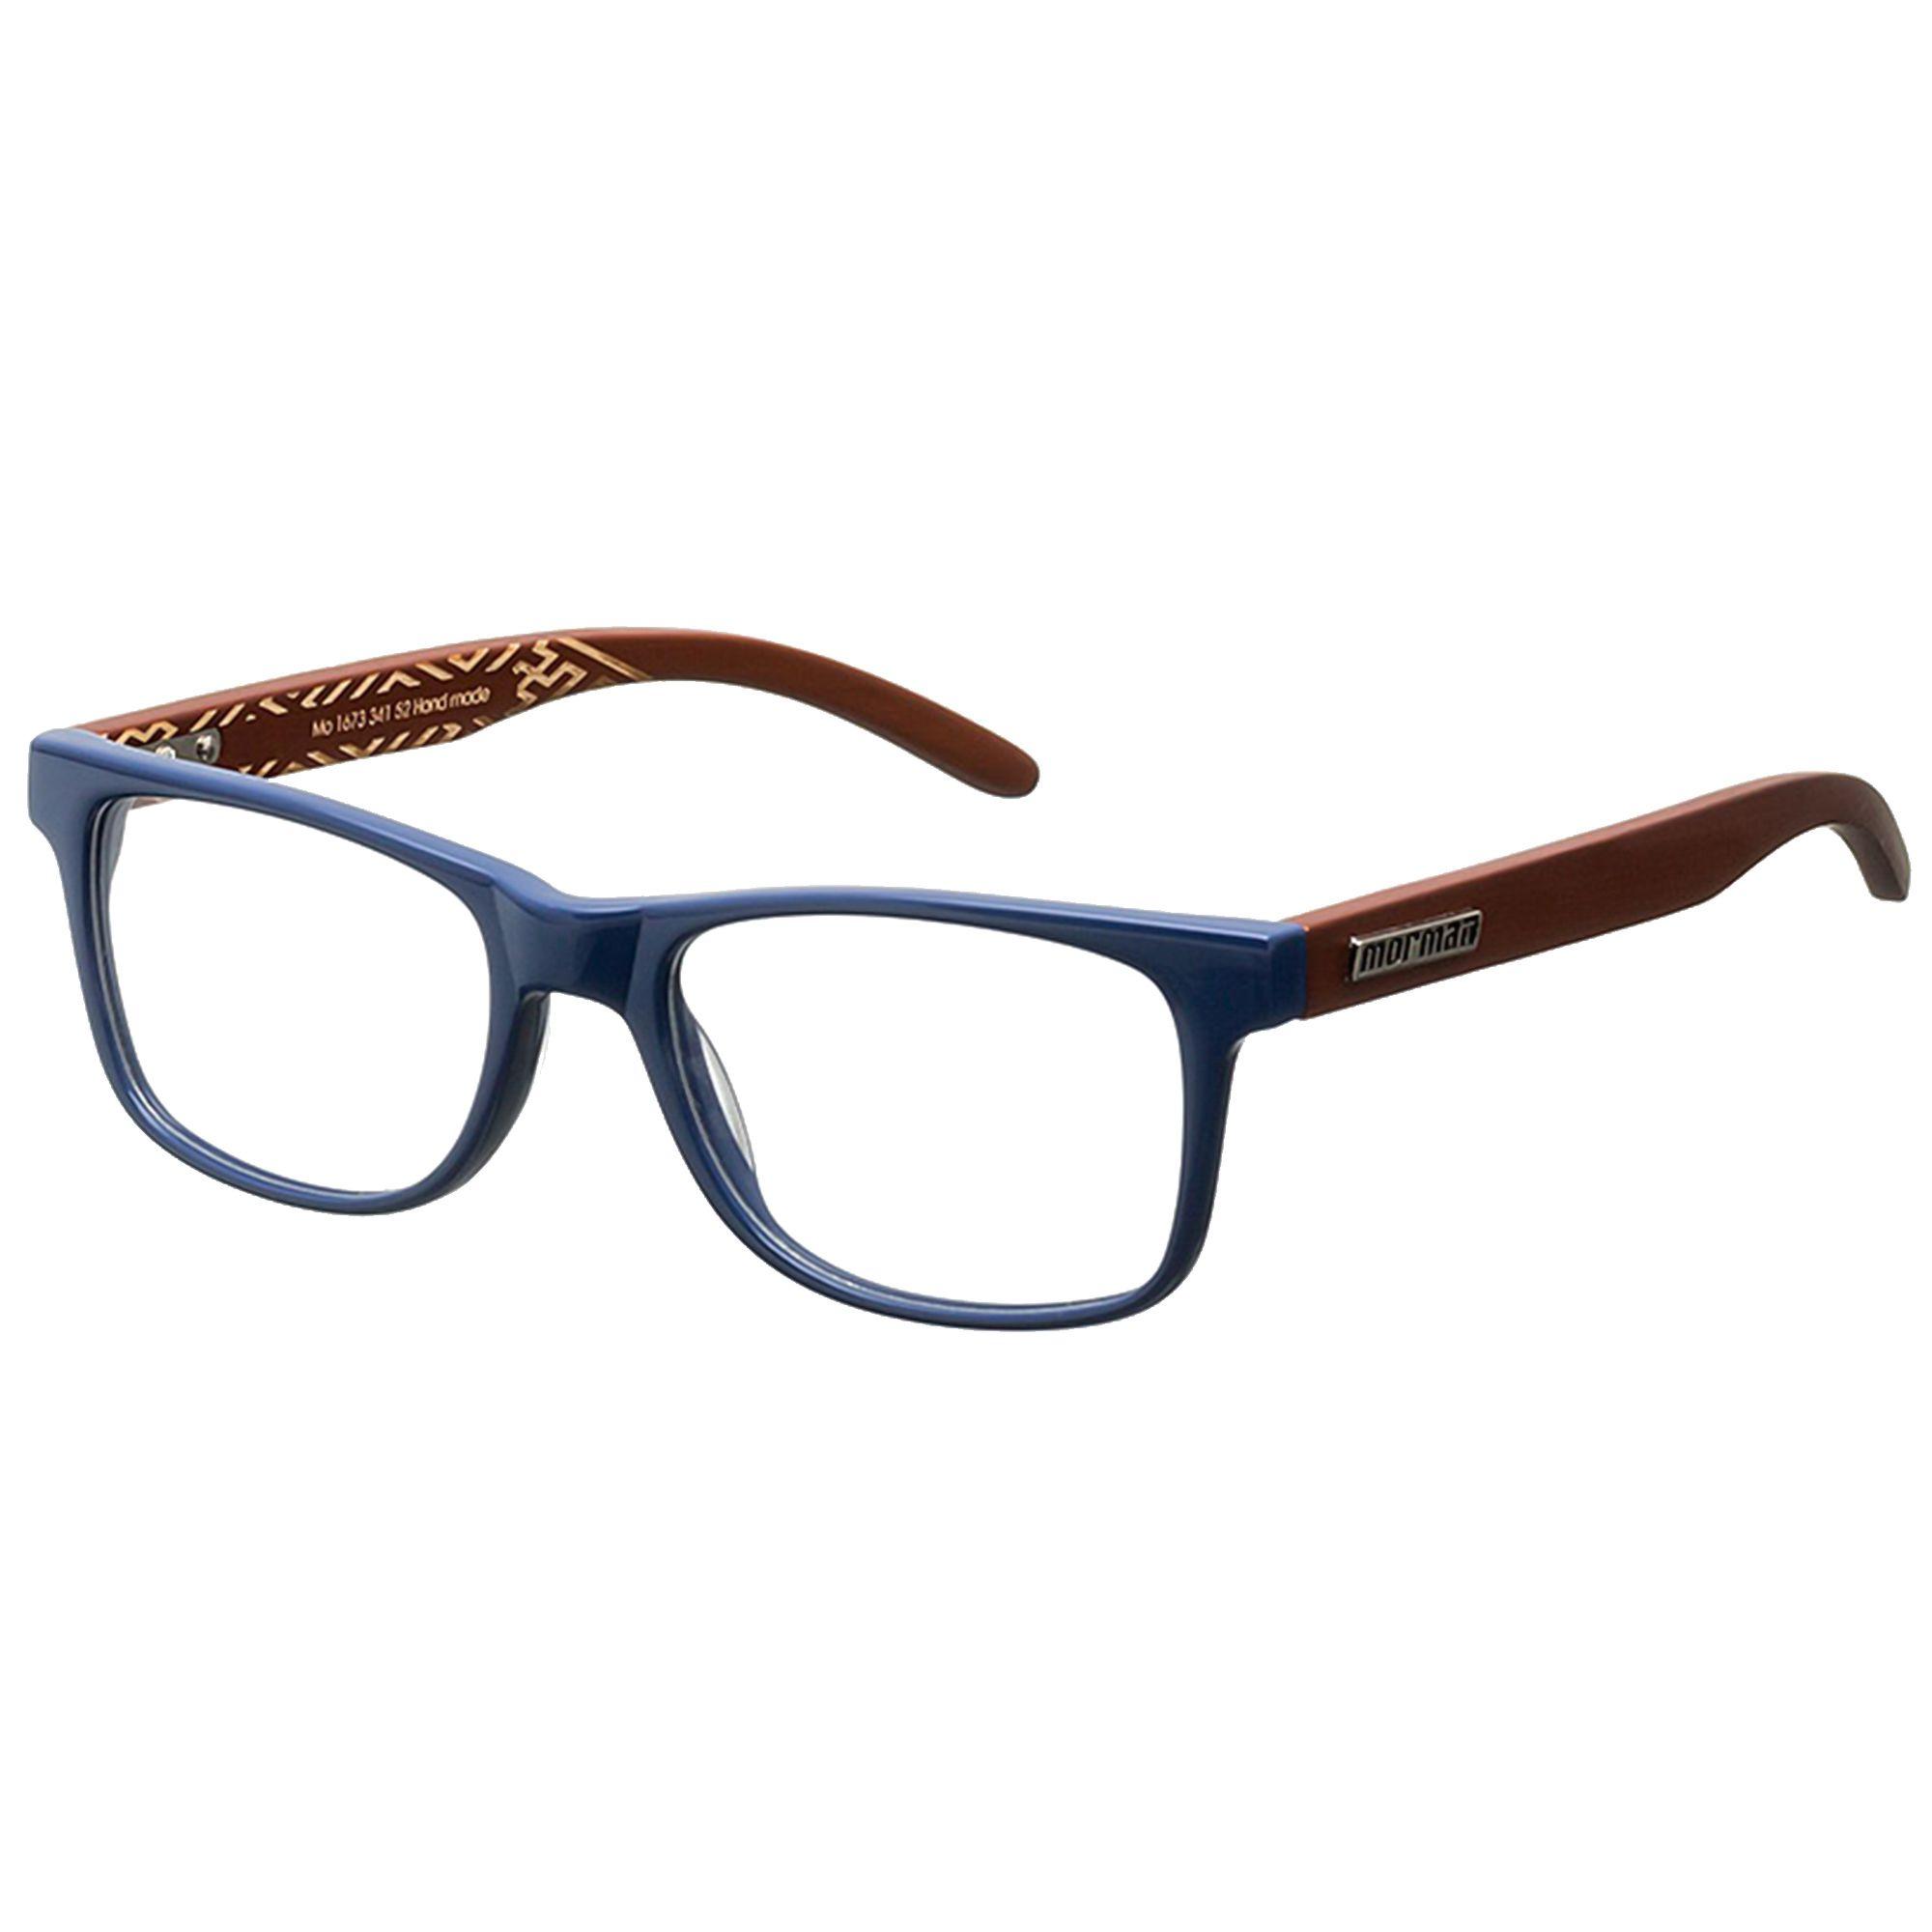 Óculos de Grau Masculino Mormaii 167334152 Bambu